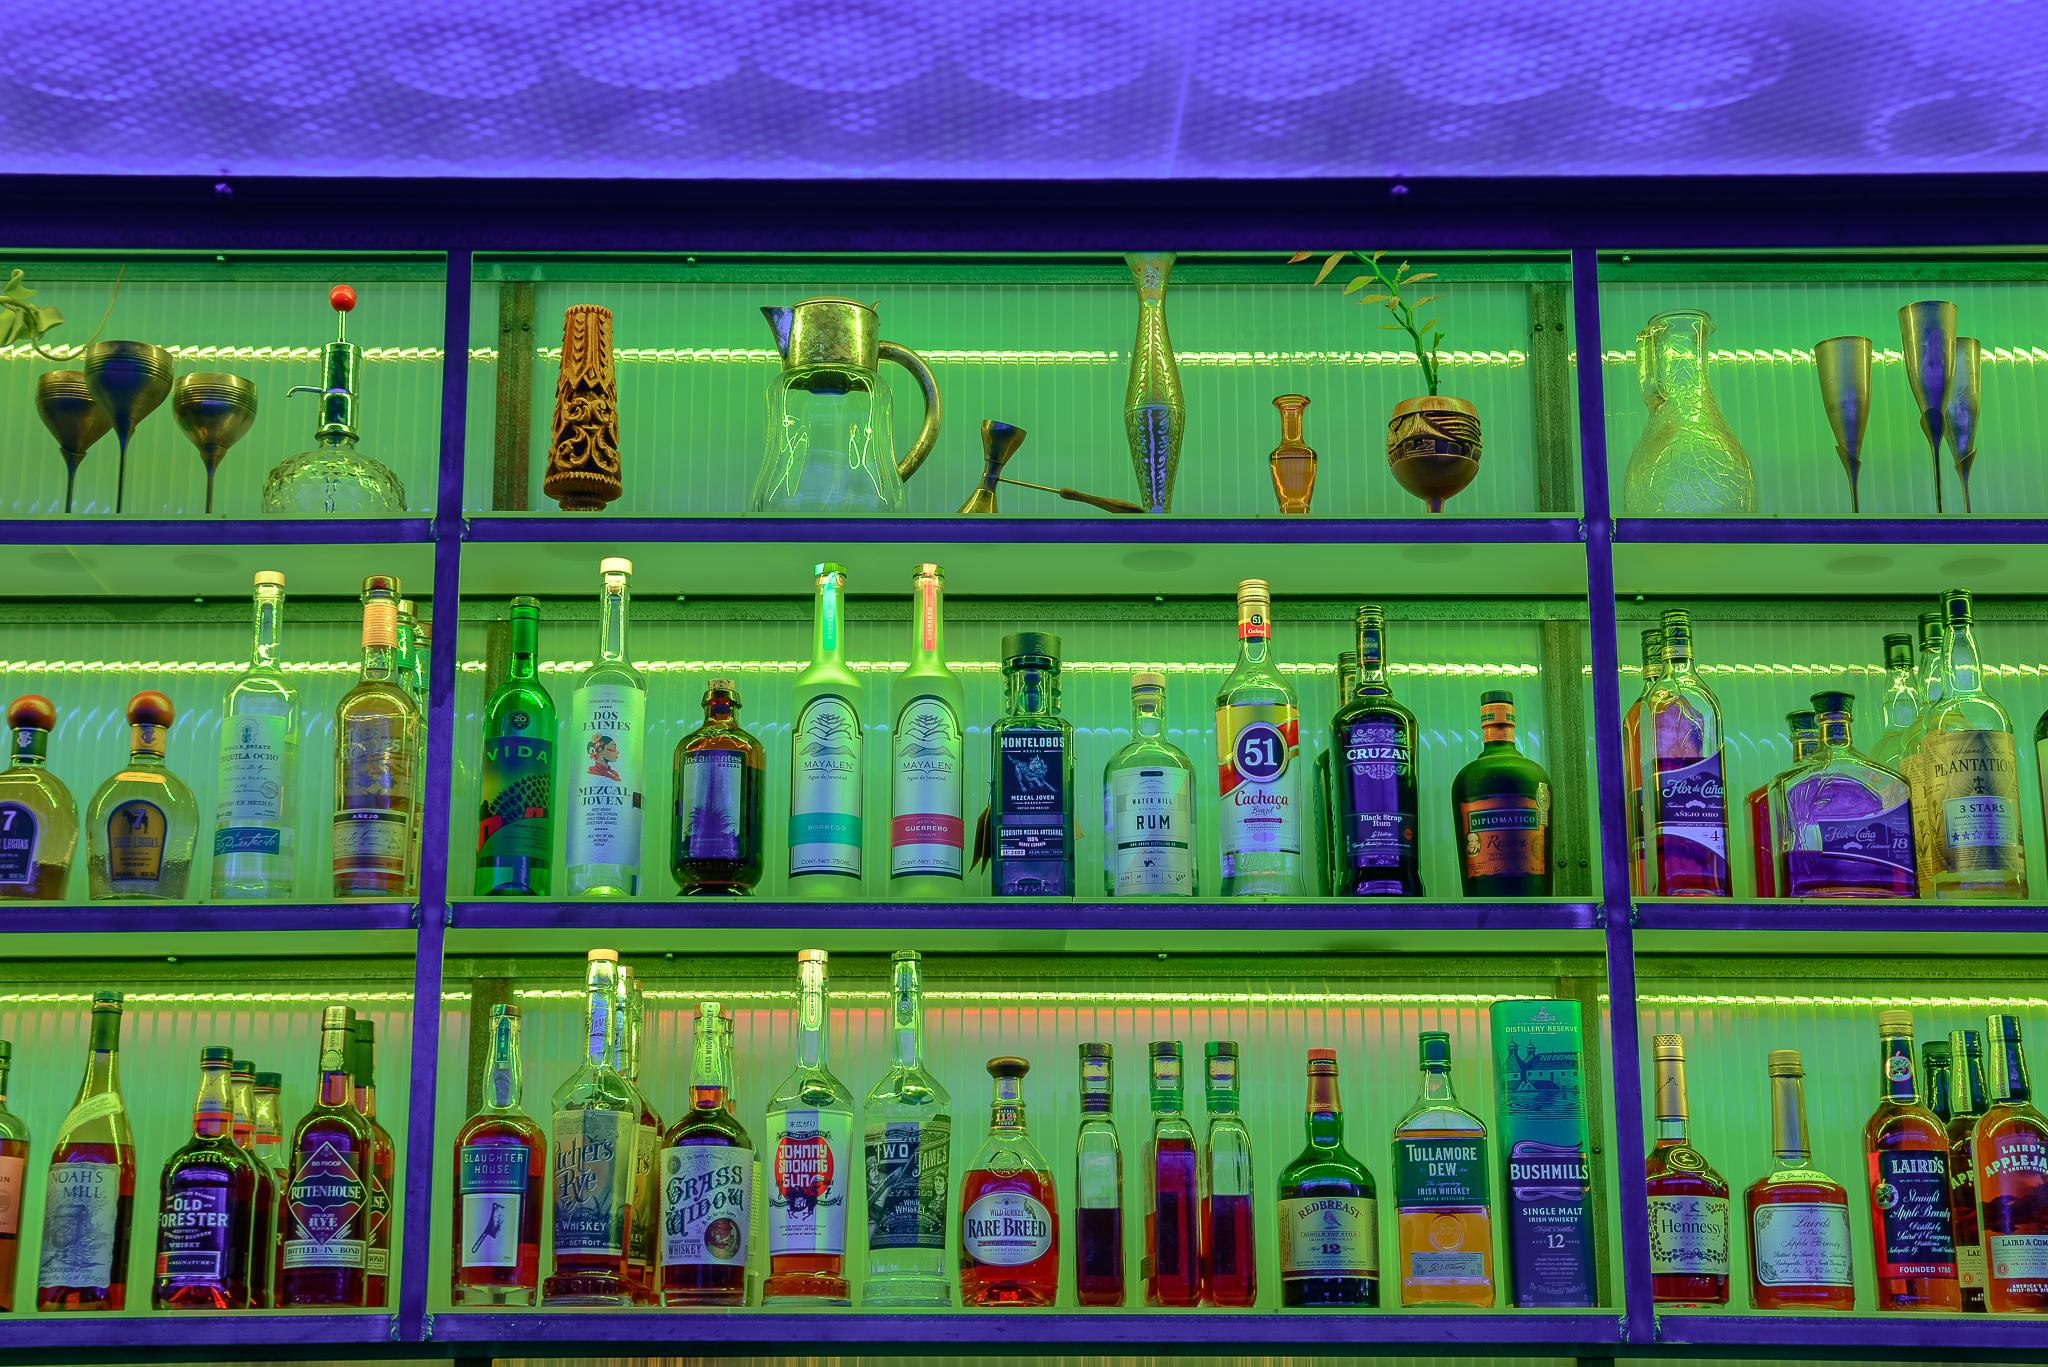 katoi_bar_shevles_green_night.jpg